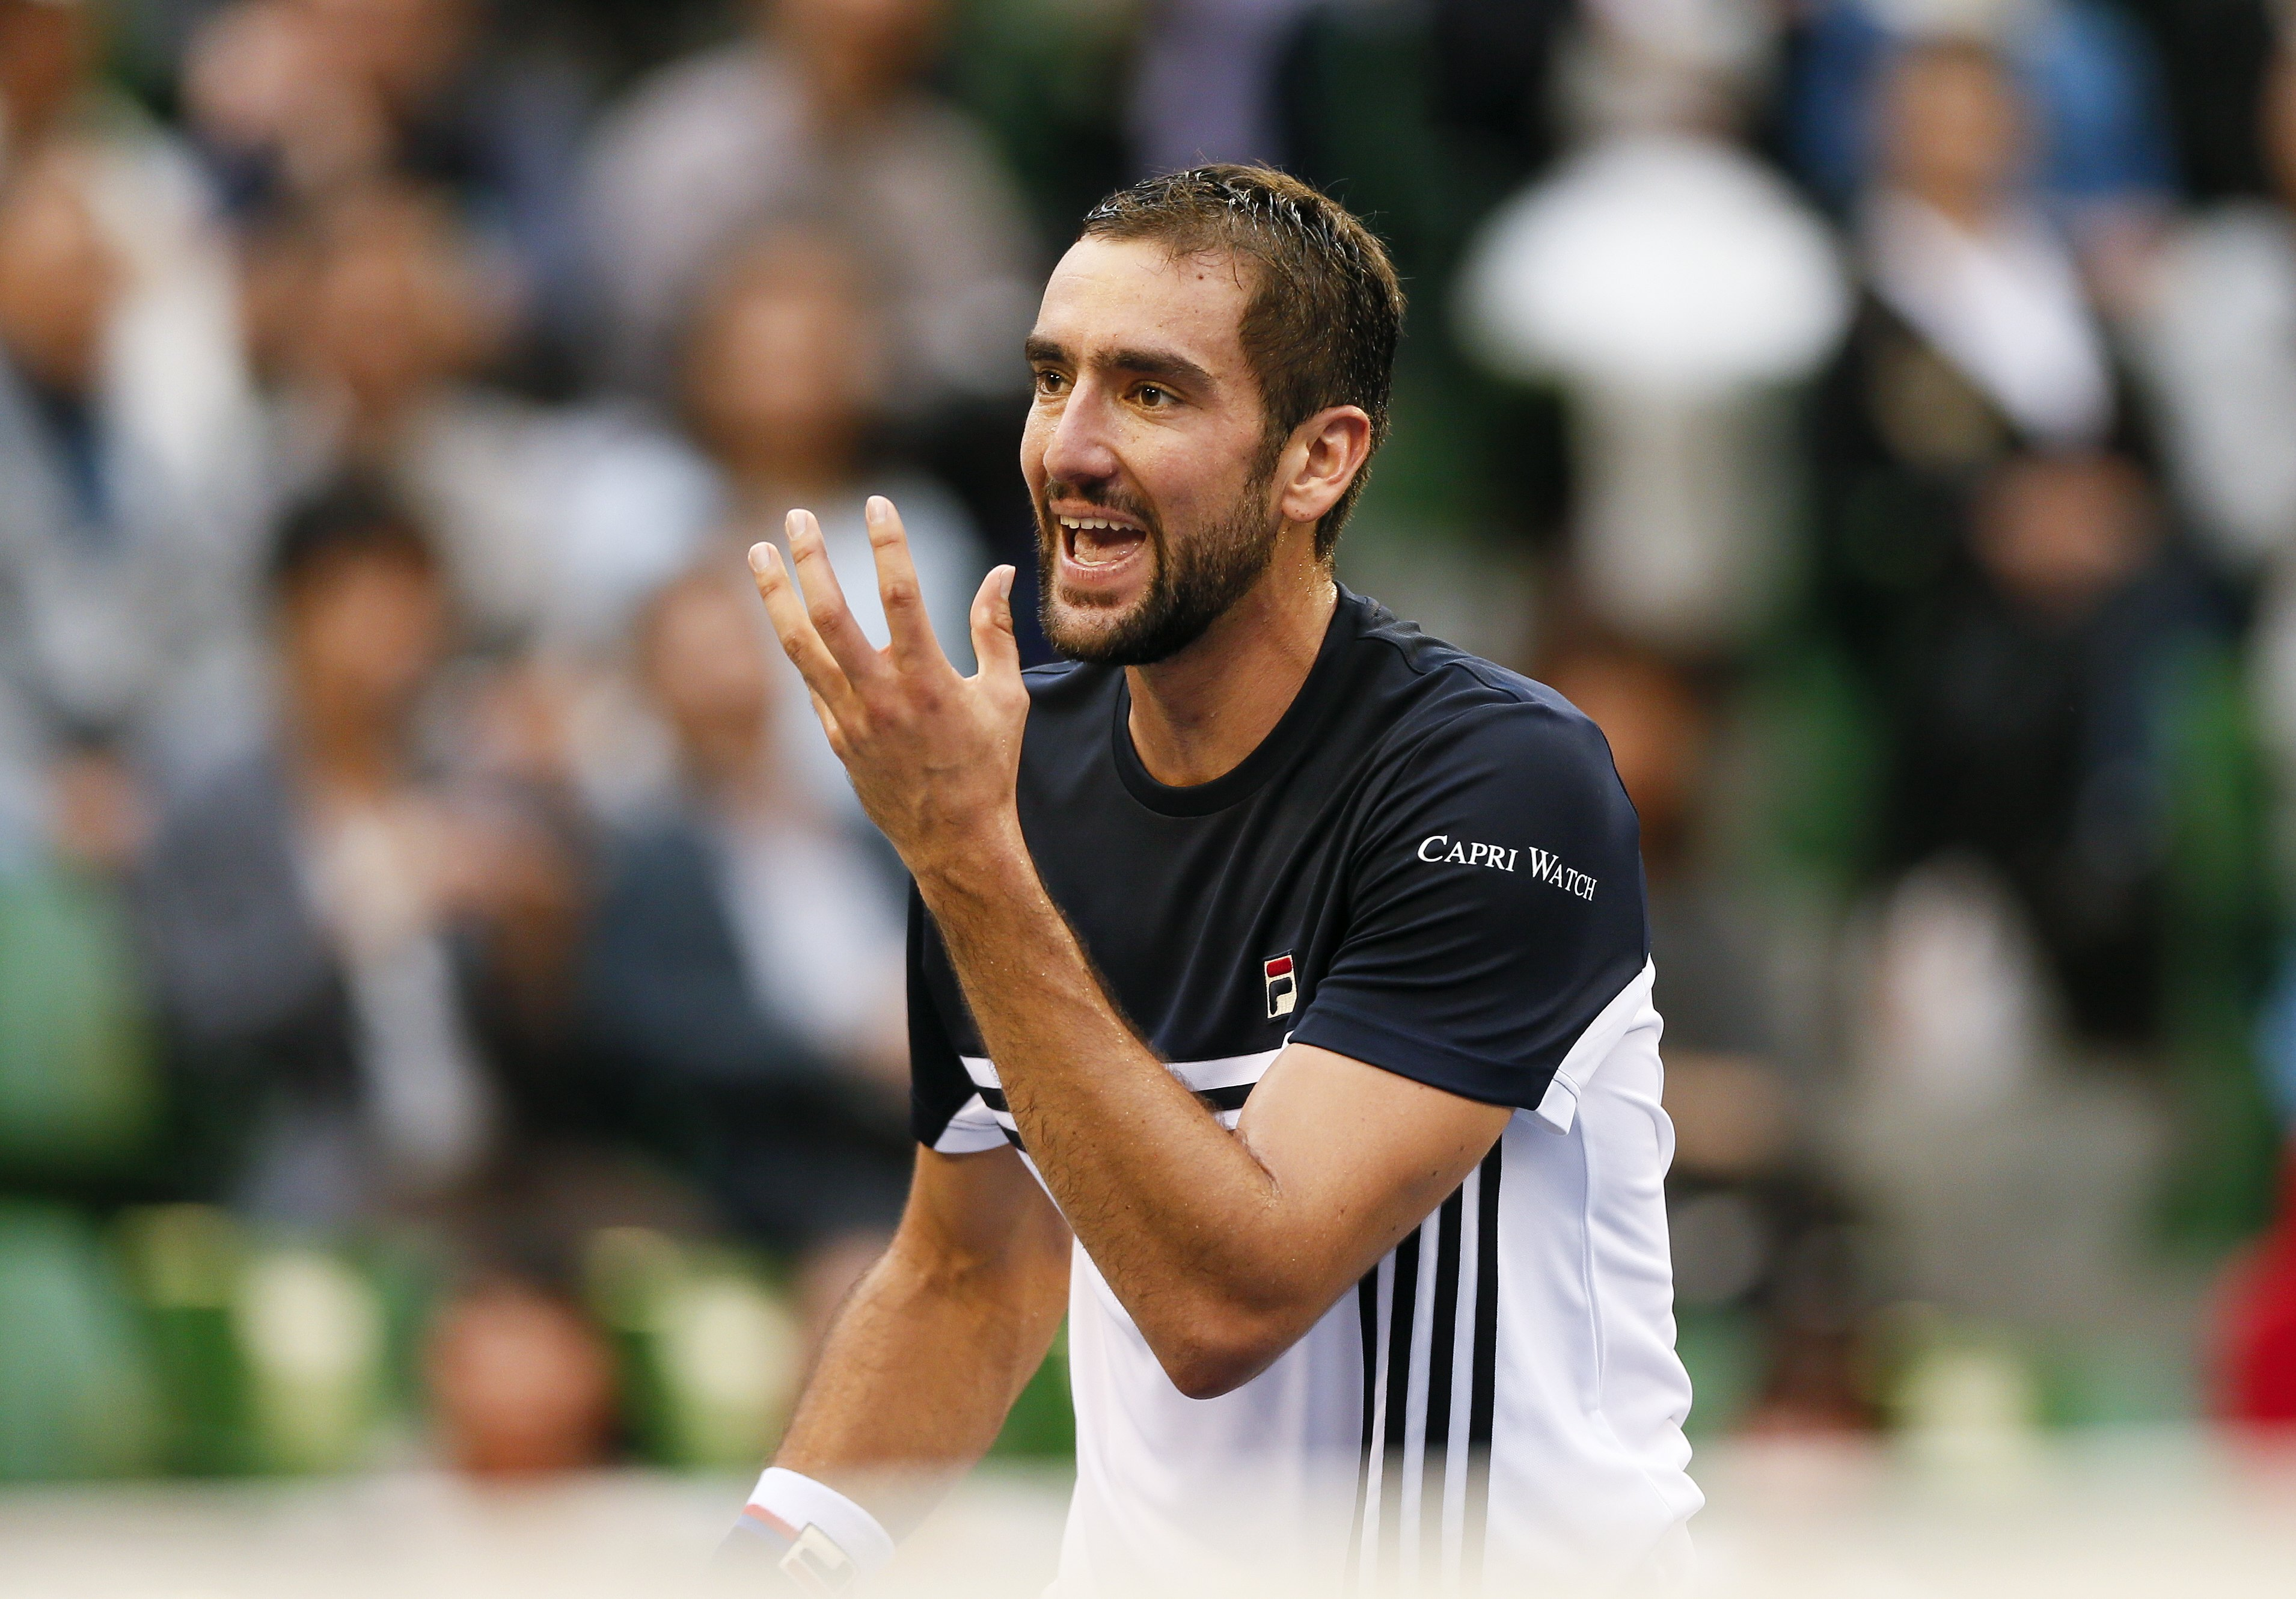 ATP Čiliću ranking karijere